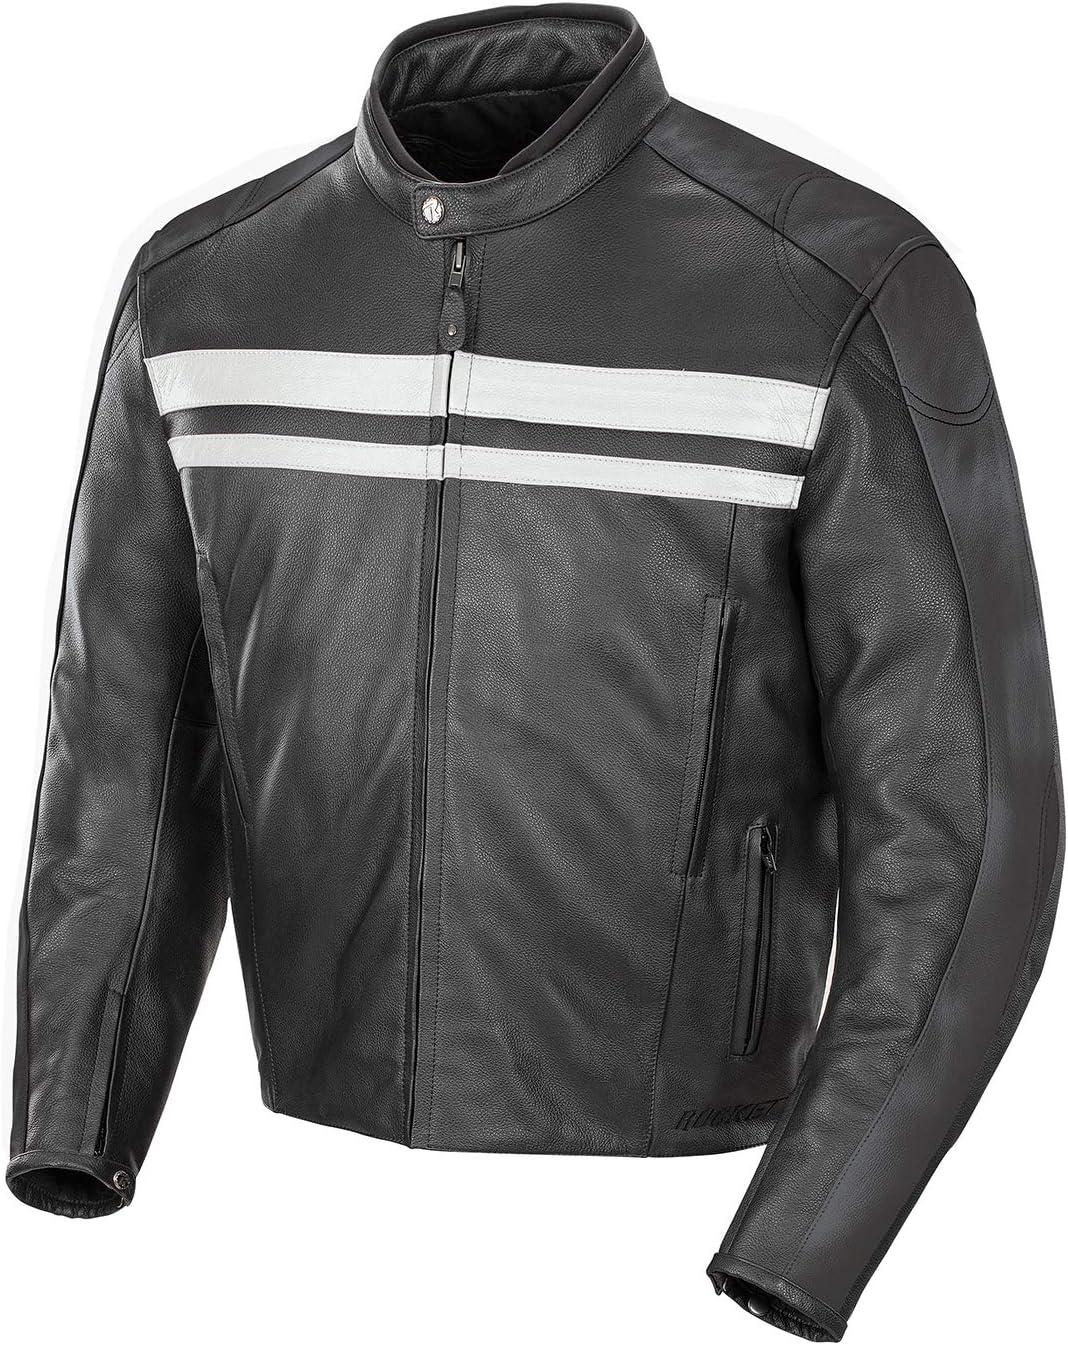 Black//Grey, Large Joe Rocket Mens Old School Leather Jacket